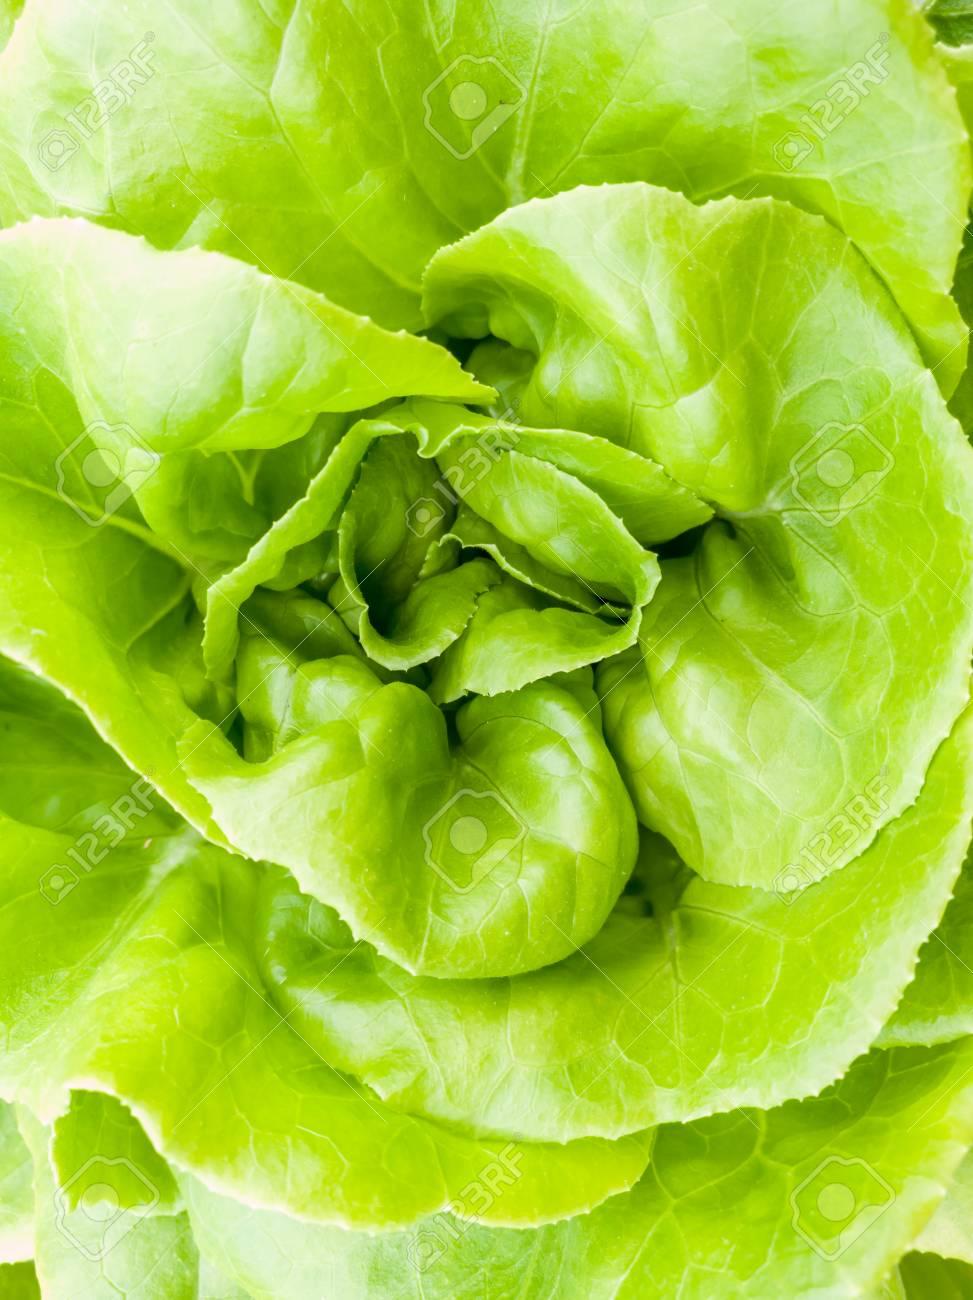 Salad vegetable green fresh lettuce in farm close up - 106236400